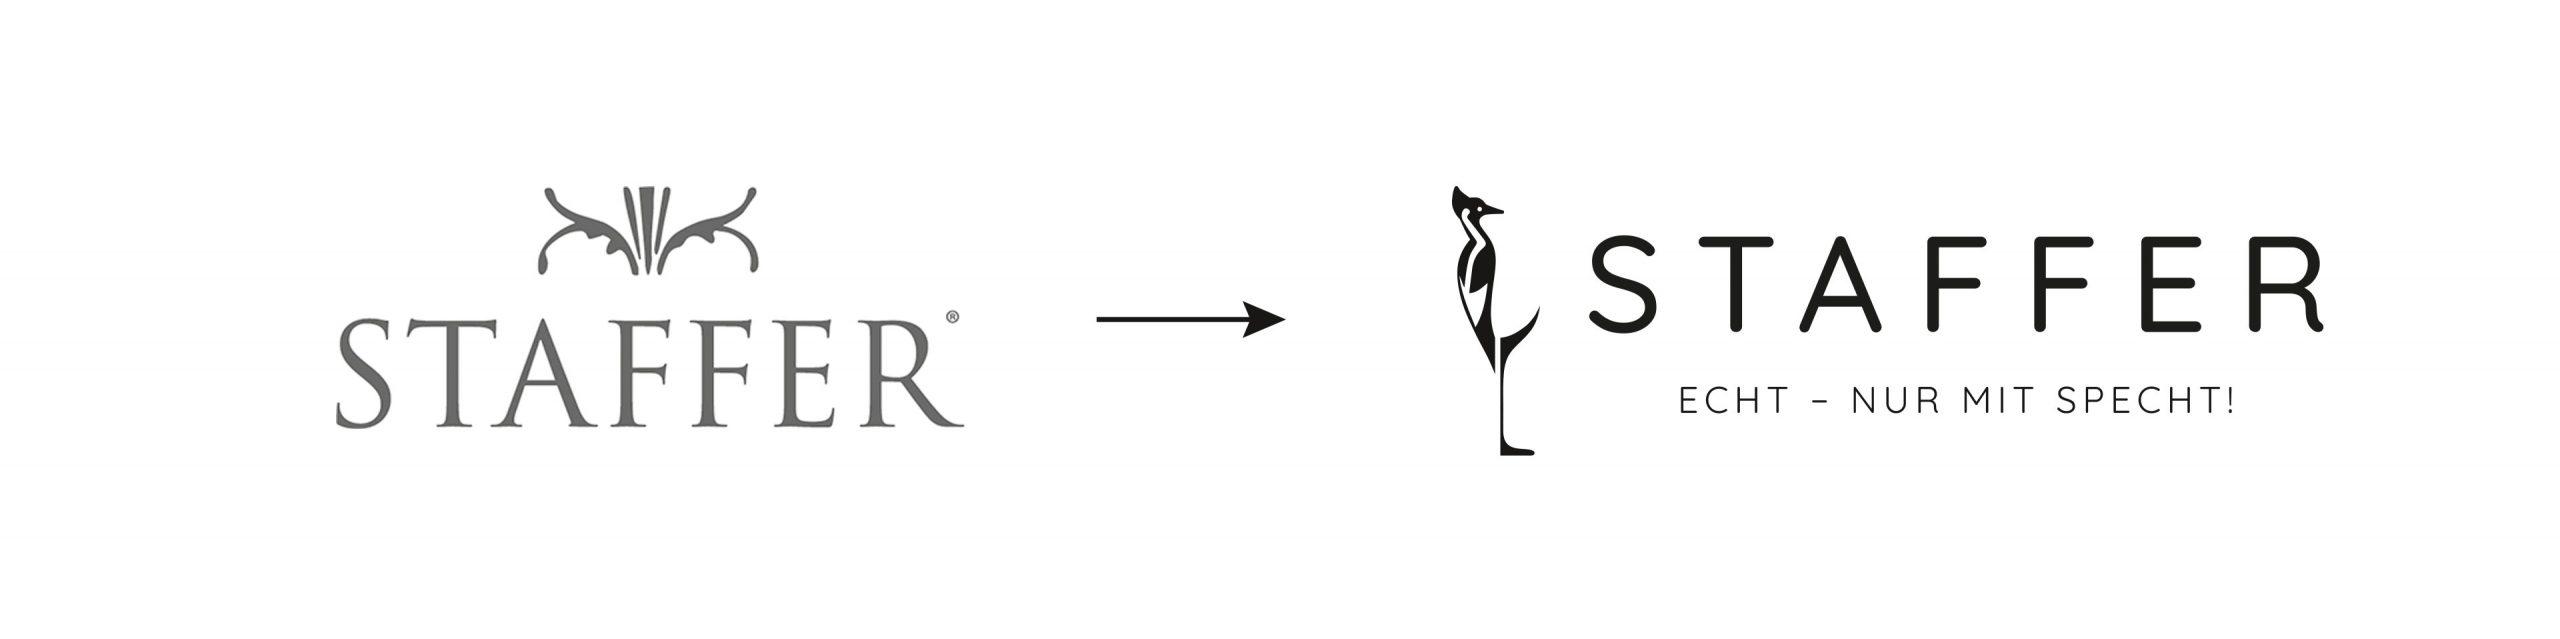 Altes vs. neues Logo